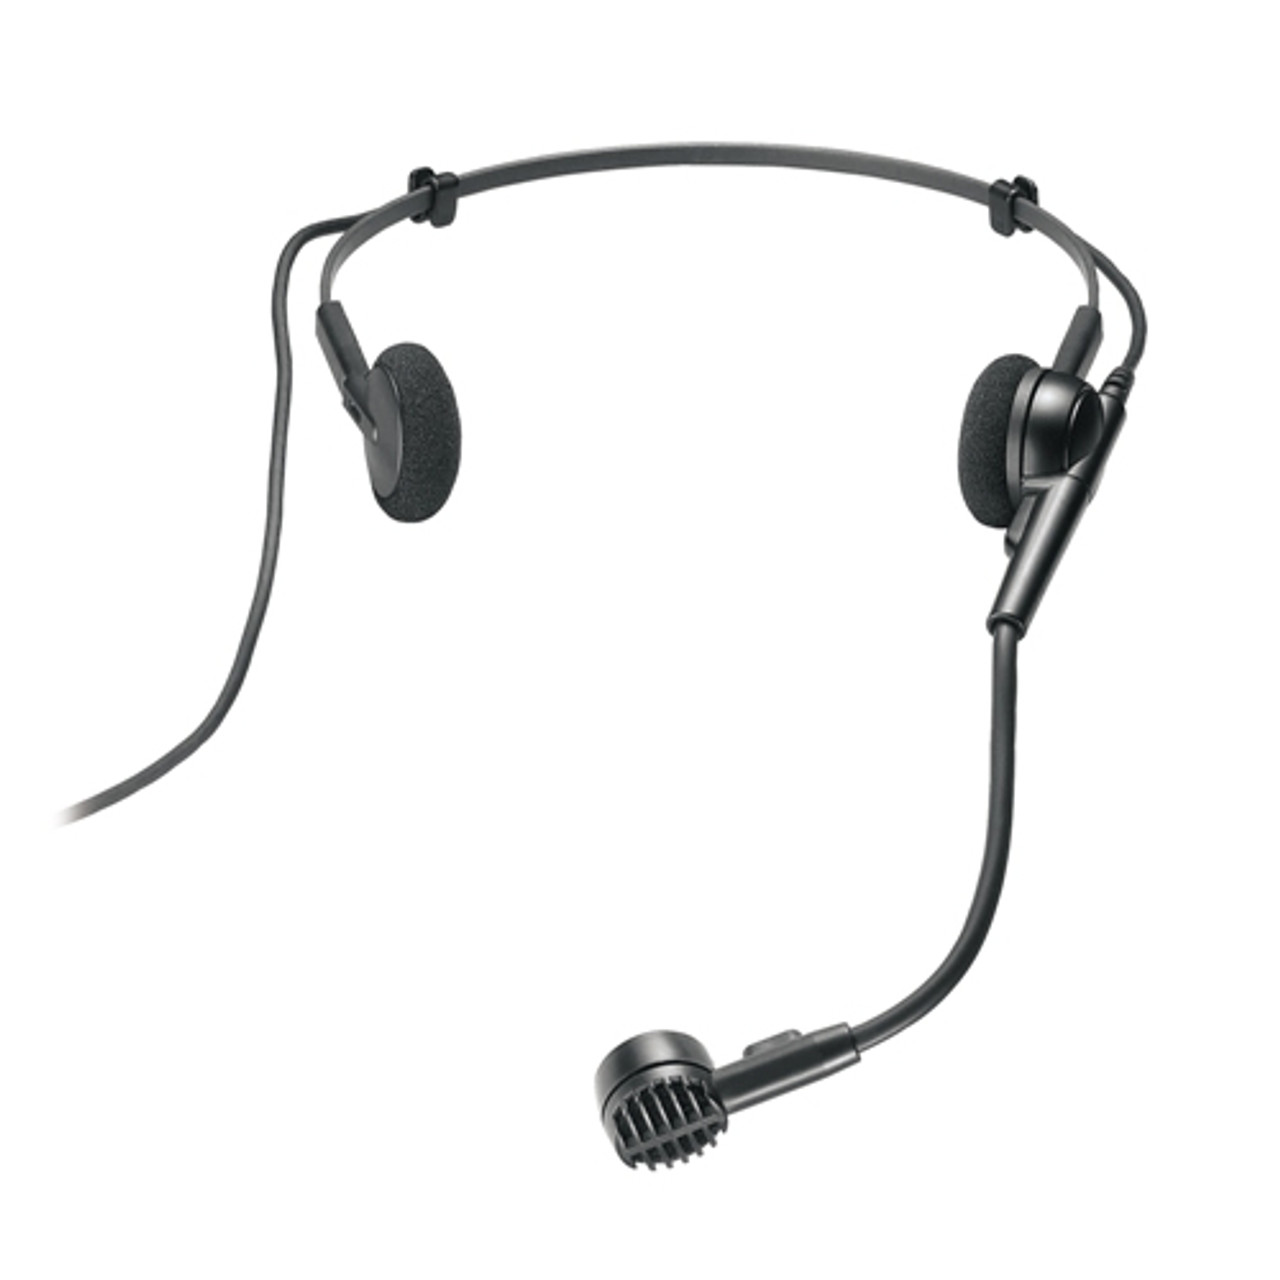 Audio-Technica ATM75CW  Headworn Vocal Microphone, less power module ATM75CW